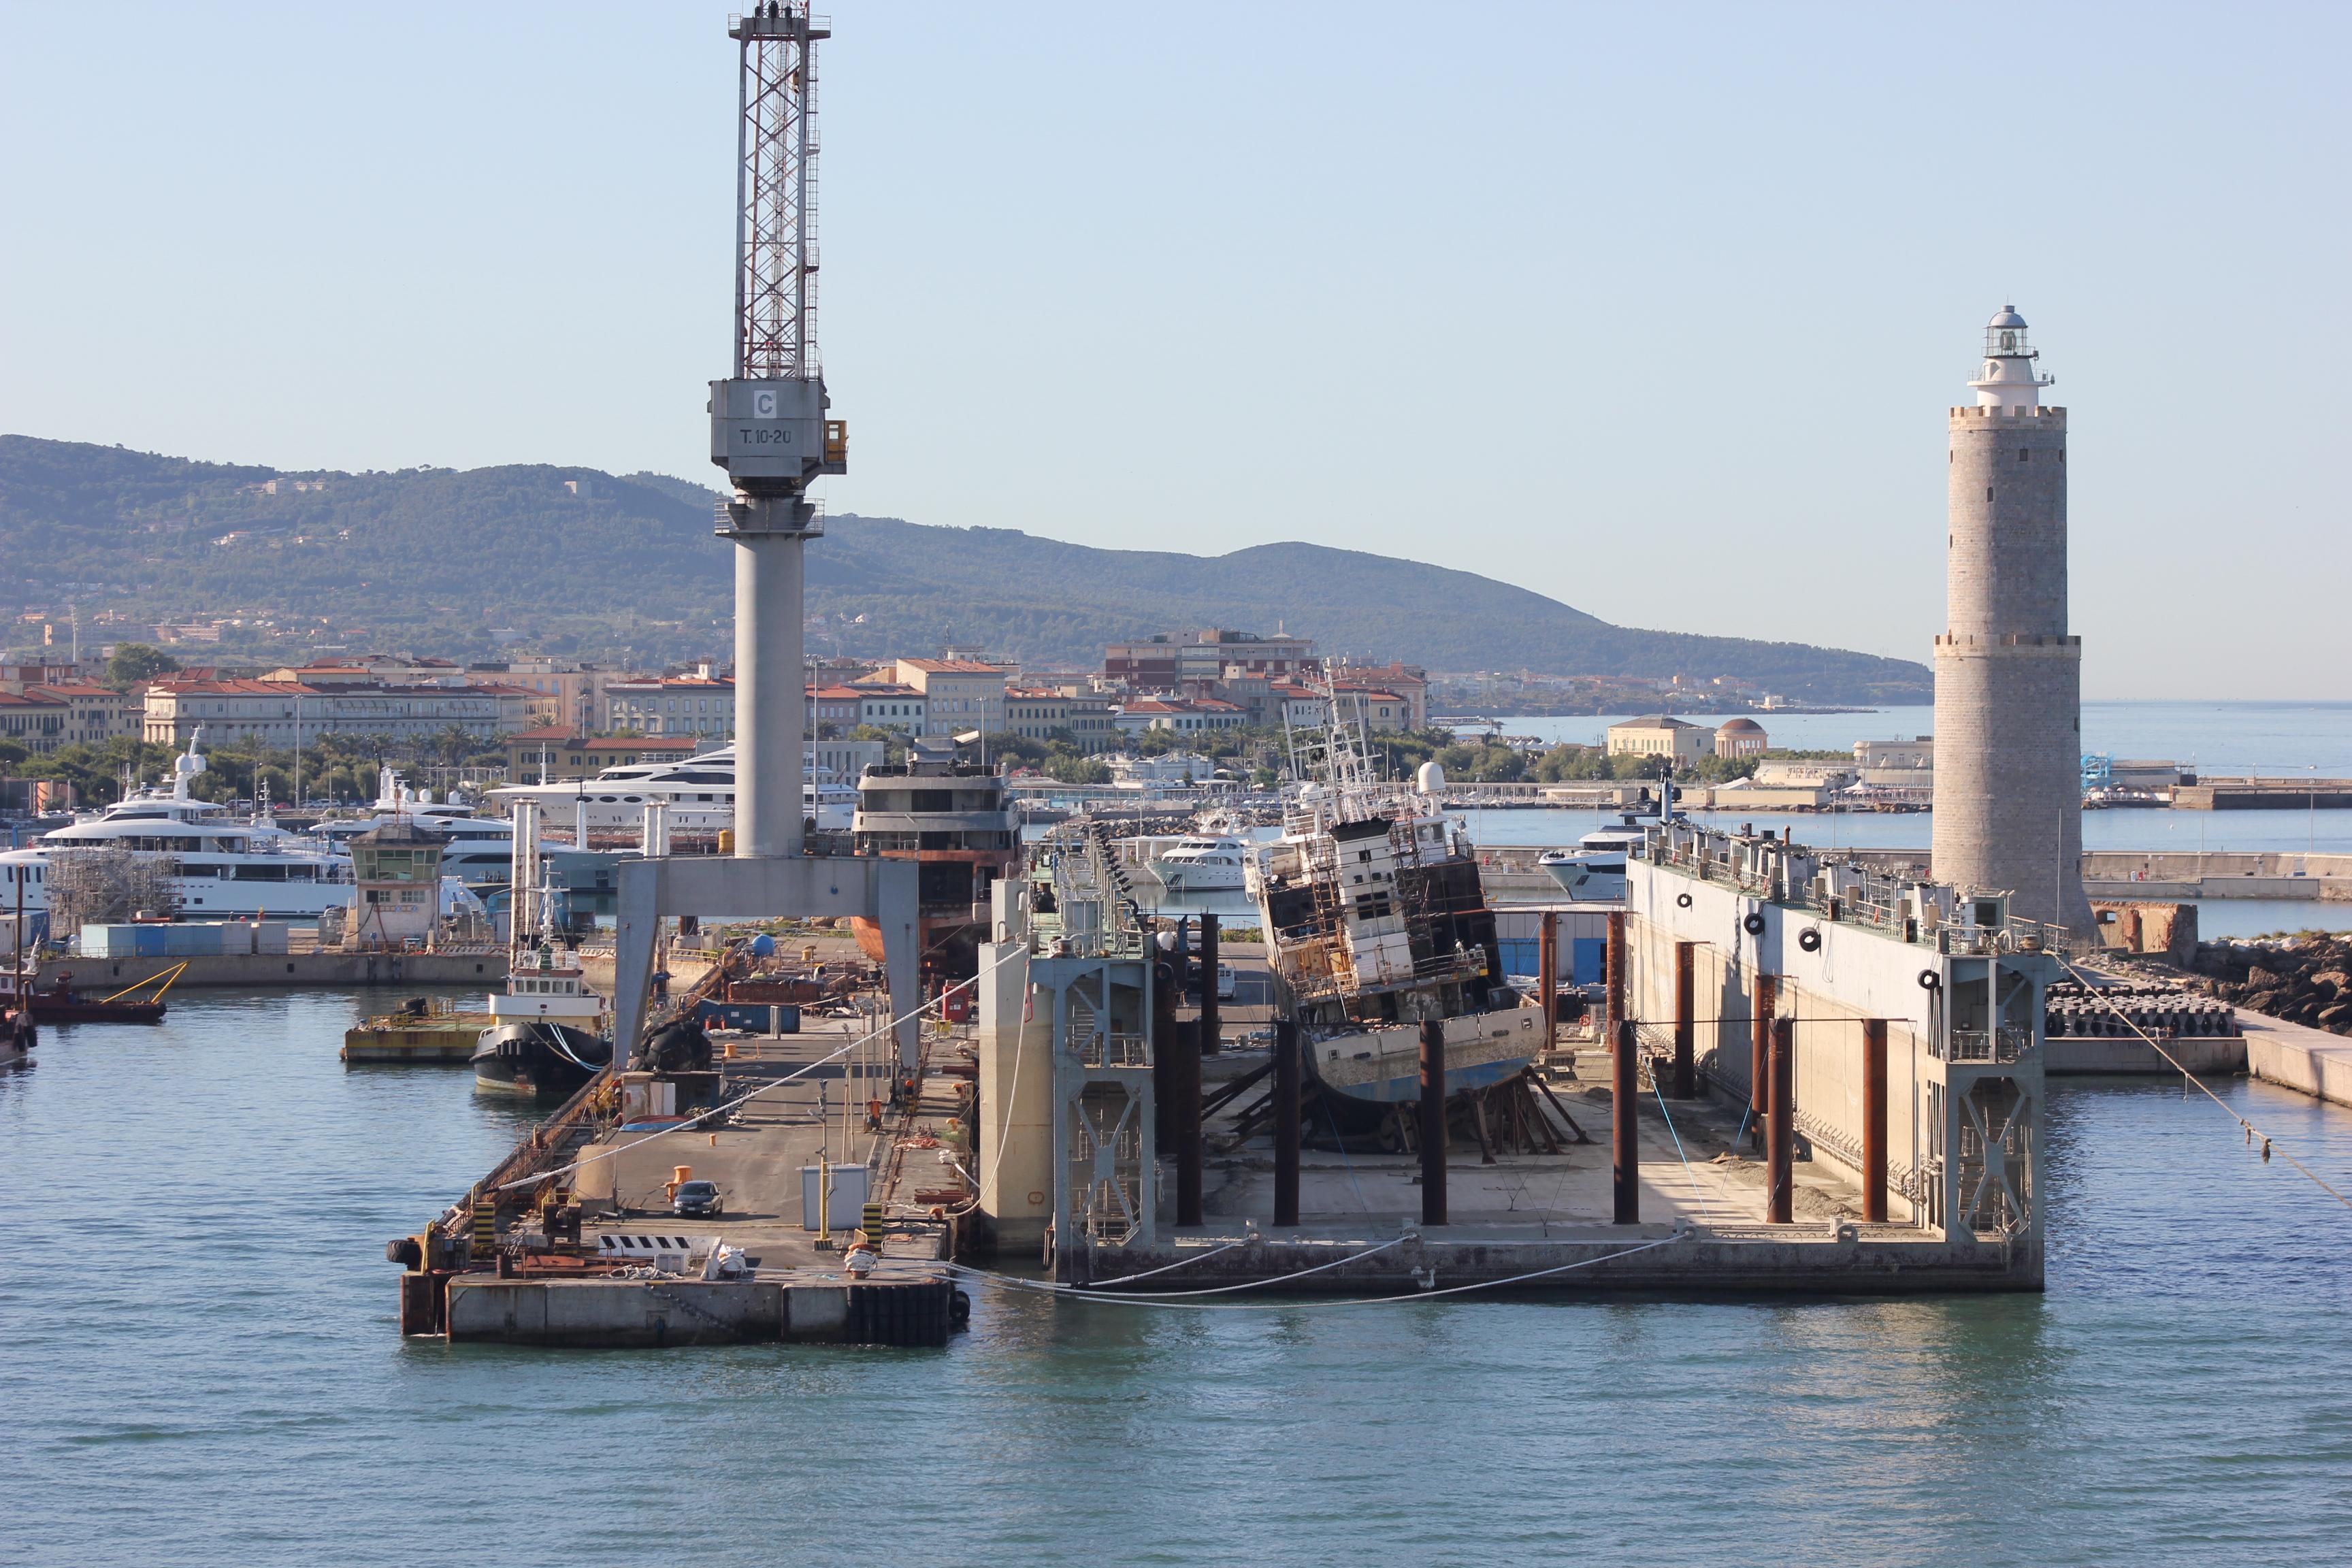 bacino galleggiante mediterraneo